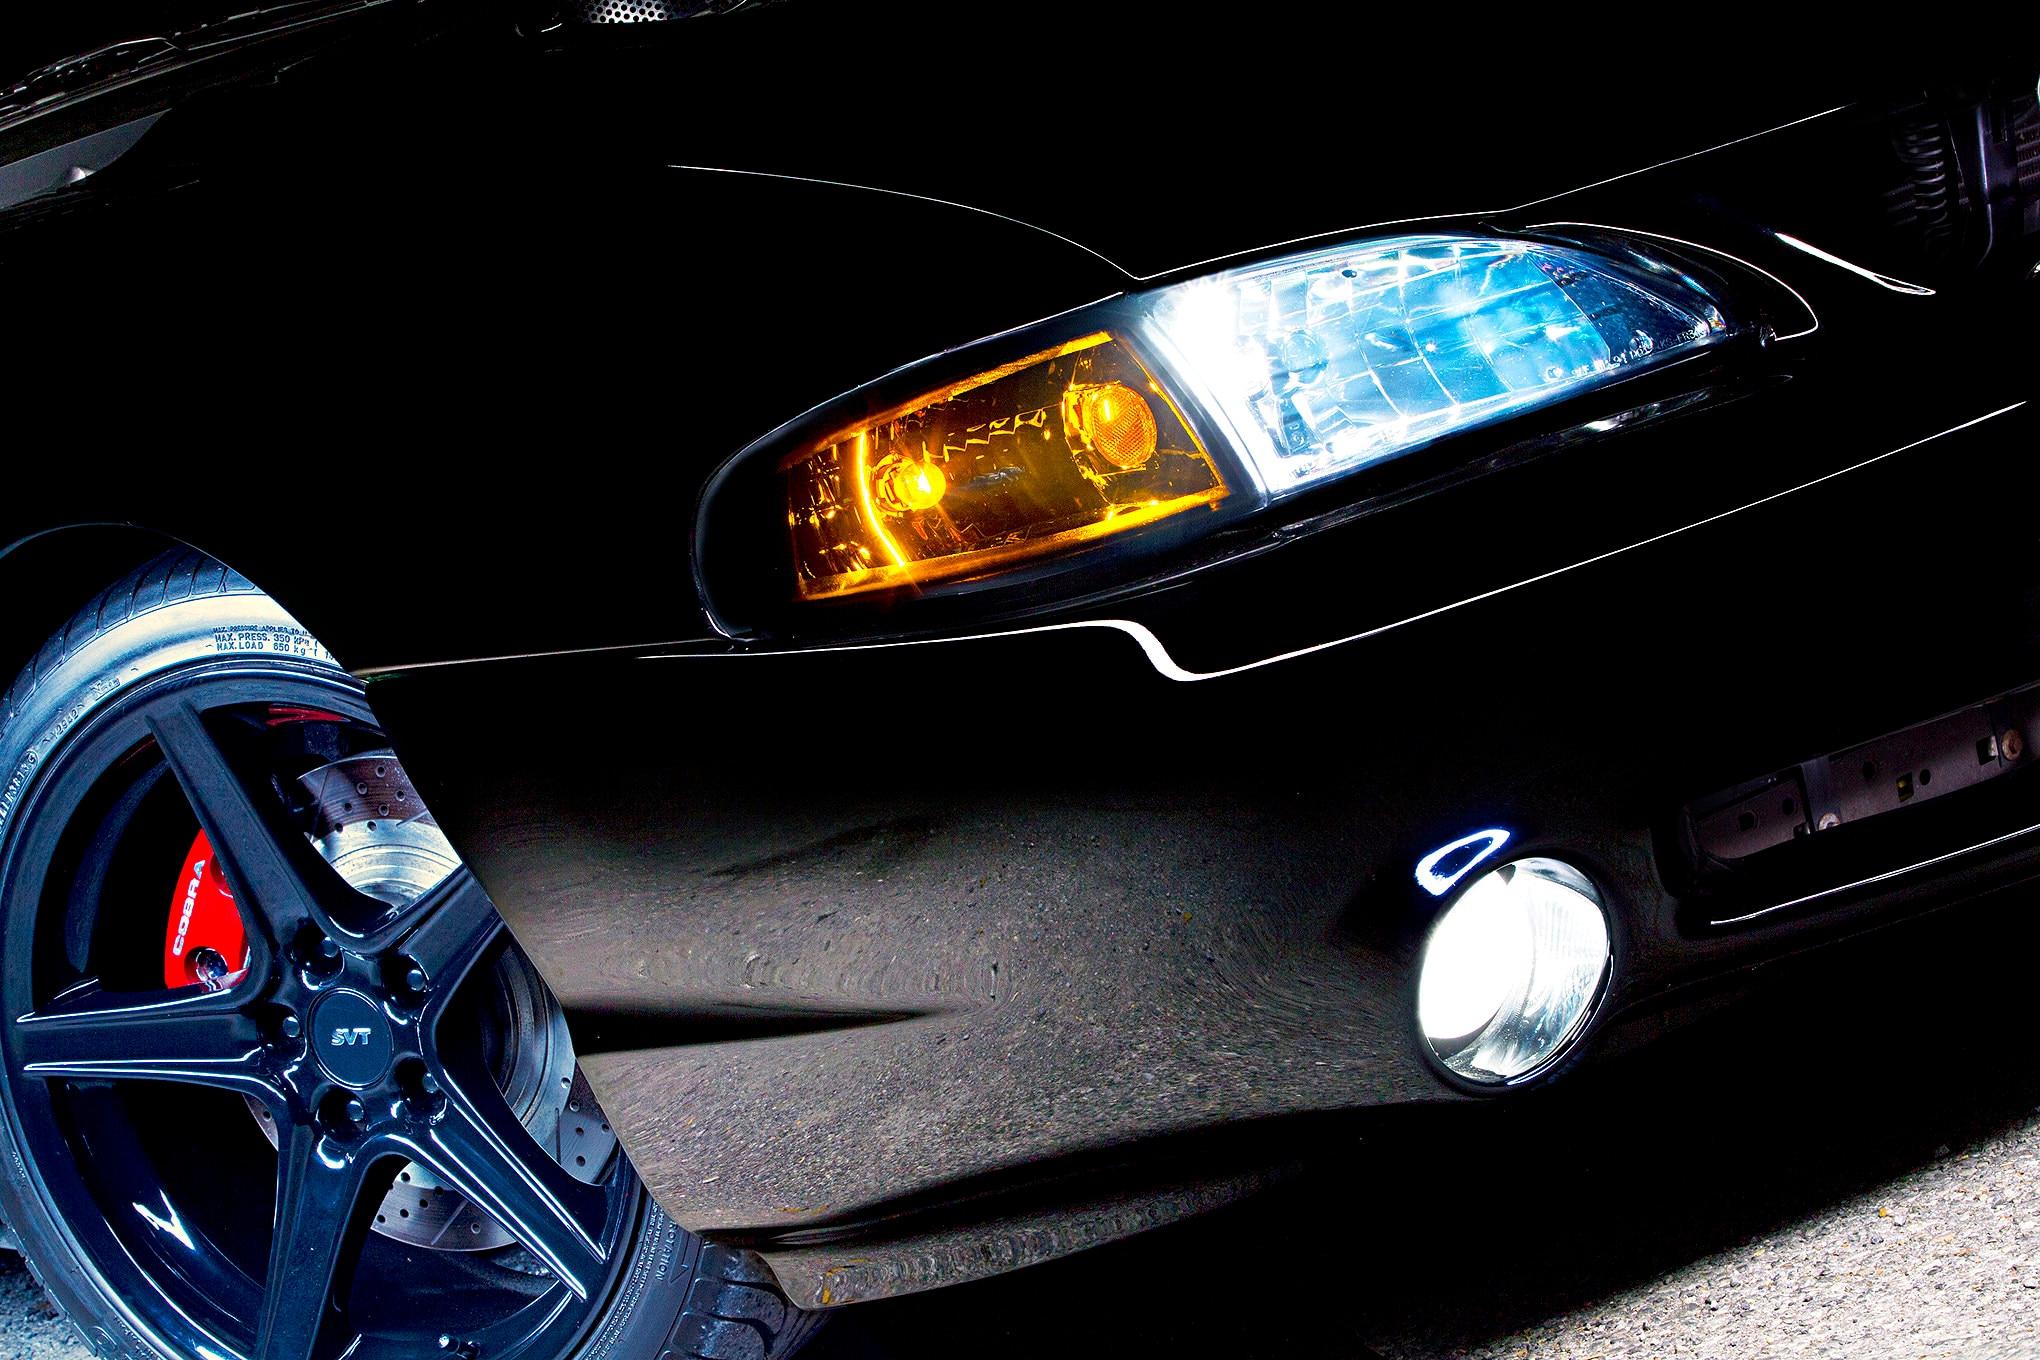 1998 Ford Mustang Cobra 025